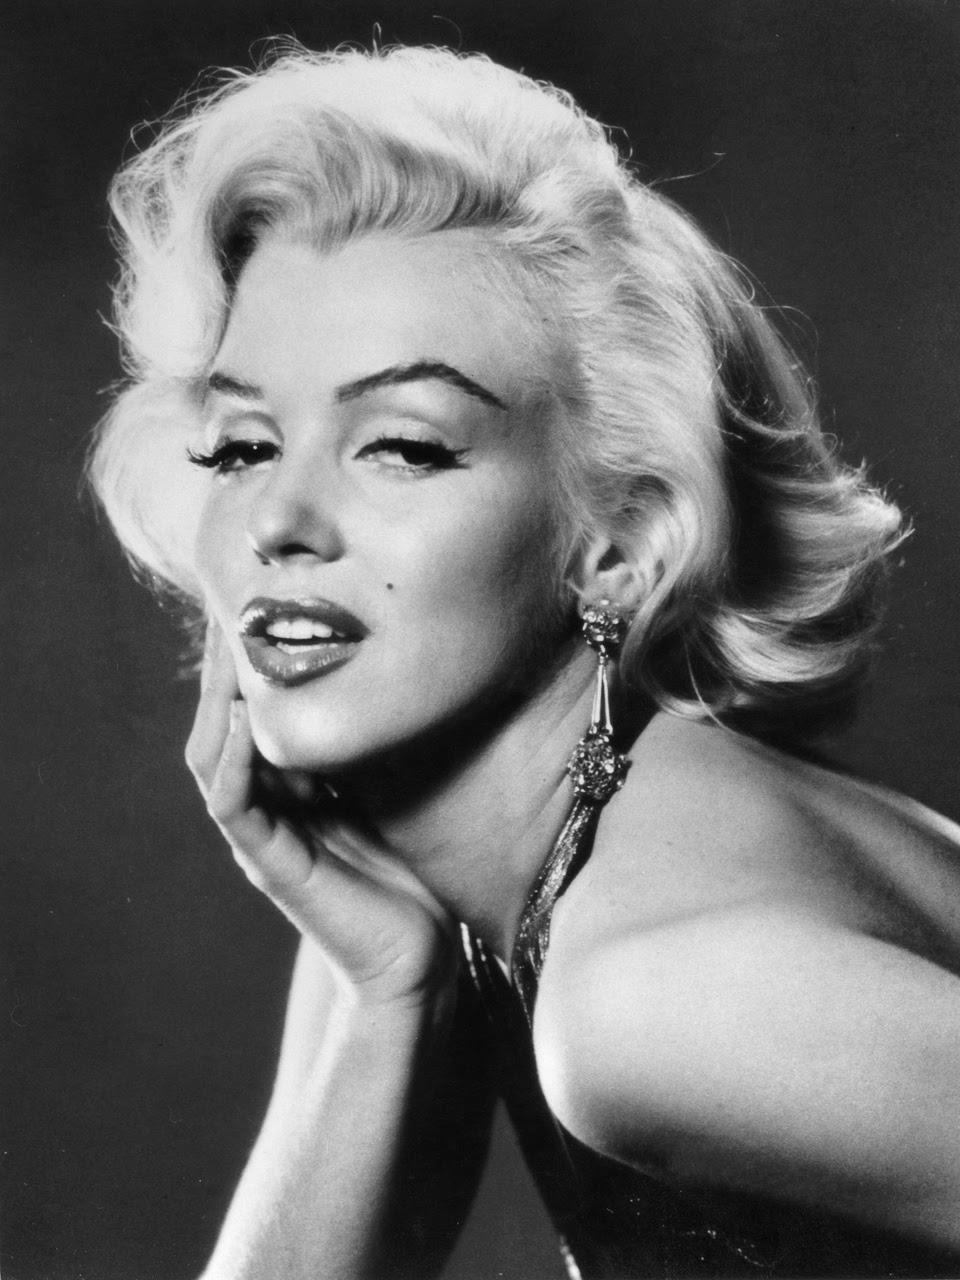 Marilyn Monroe Living Room Decor: Concierge4Fashion: Marilyn Monroe The Most Beautiful Woman